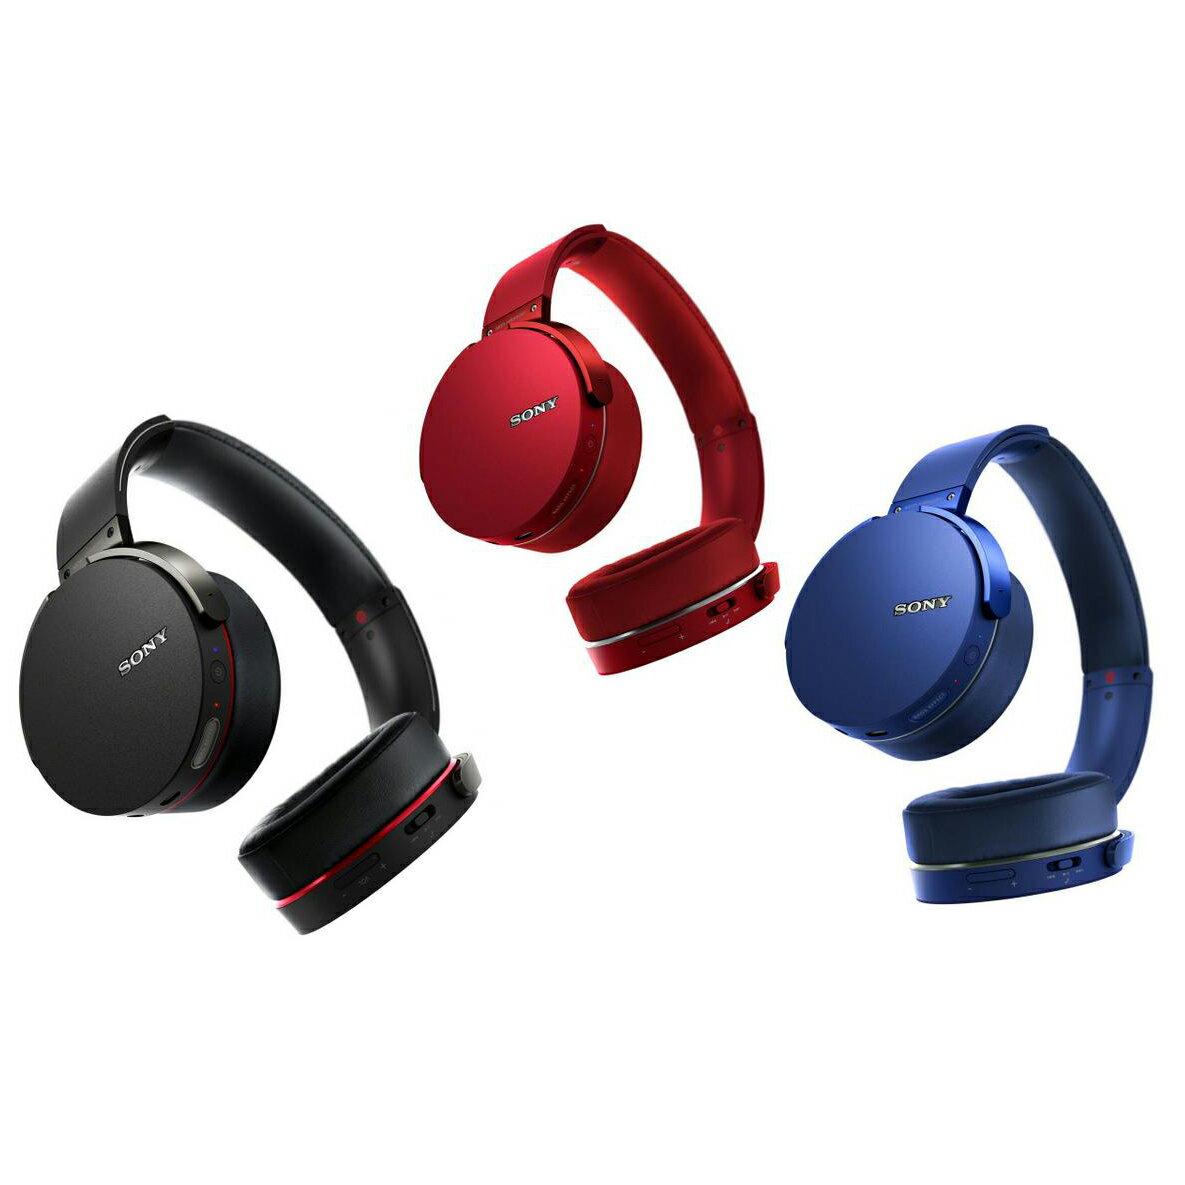 SONY MDR-XB950B1 無線耳機 EXTRA BASS 藍芽 NFC 公司貨 - 限時優惠好康折扣